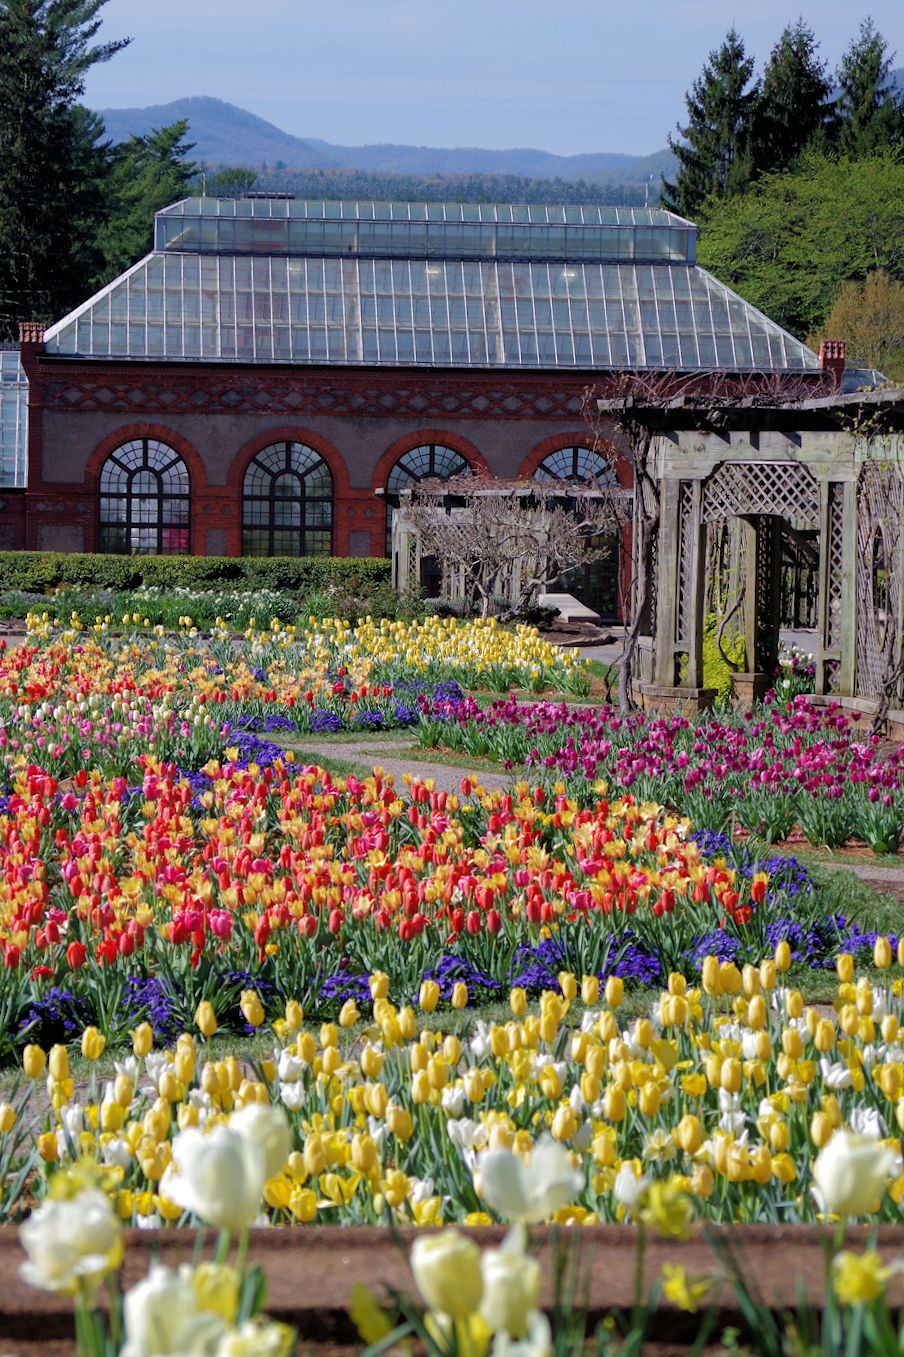 bc60b5eaa9c8ffb090c02e8bd31bd231 - Best Time To Visit Biltmore Gardens